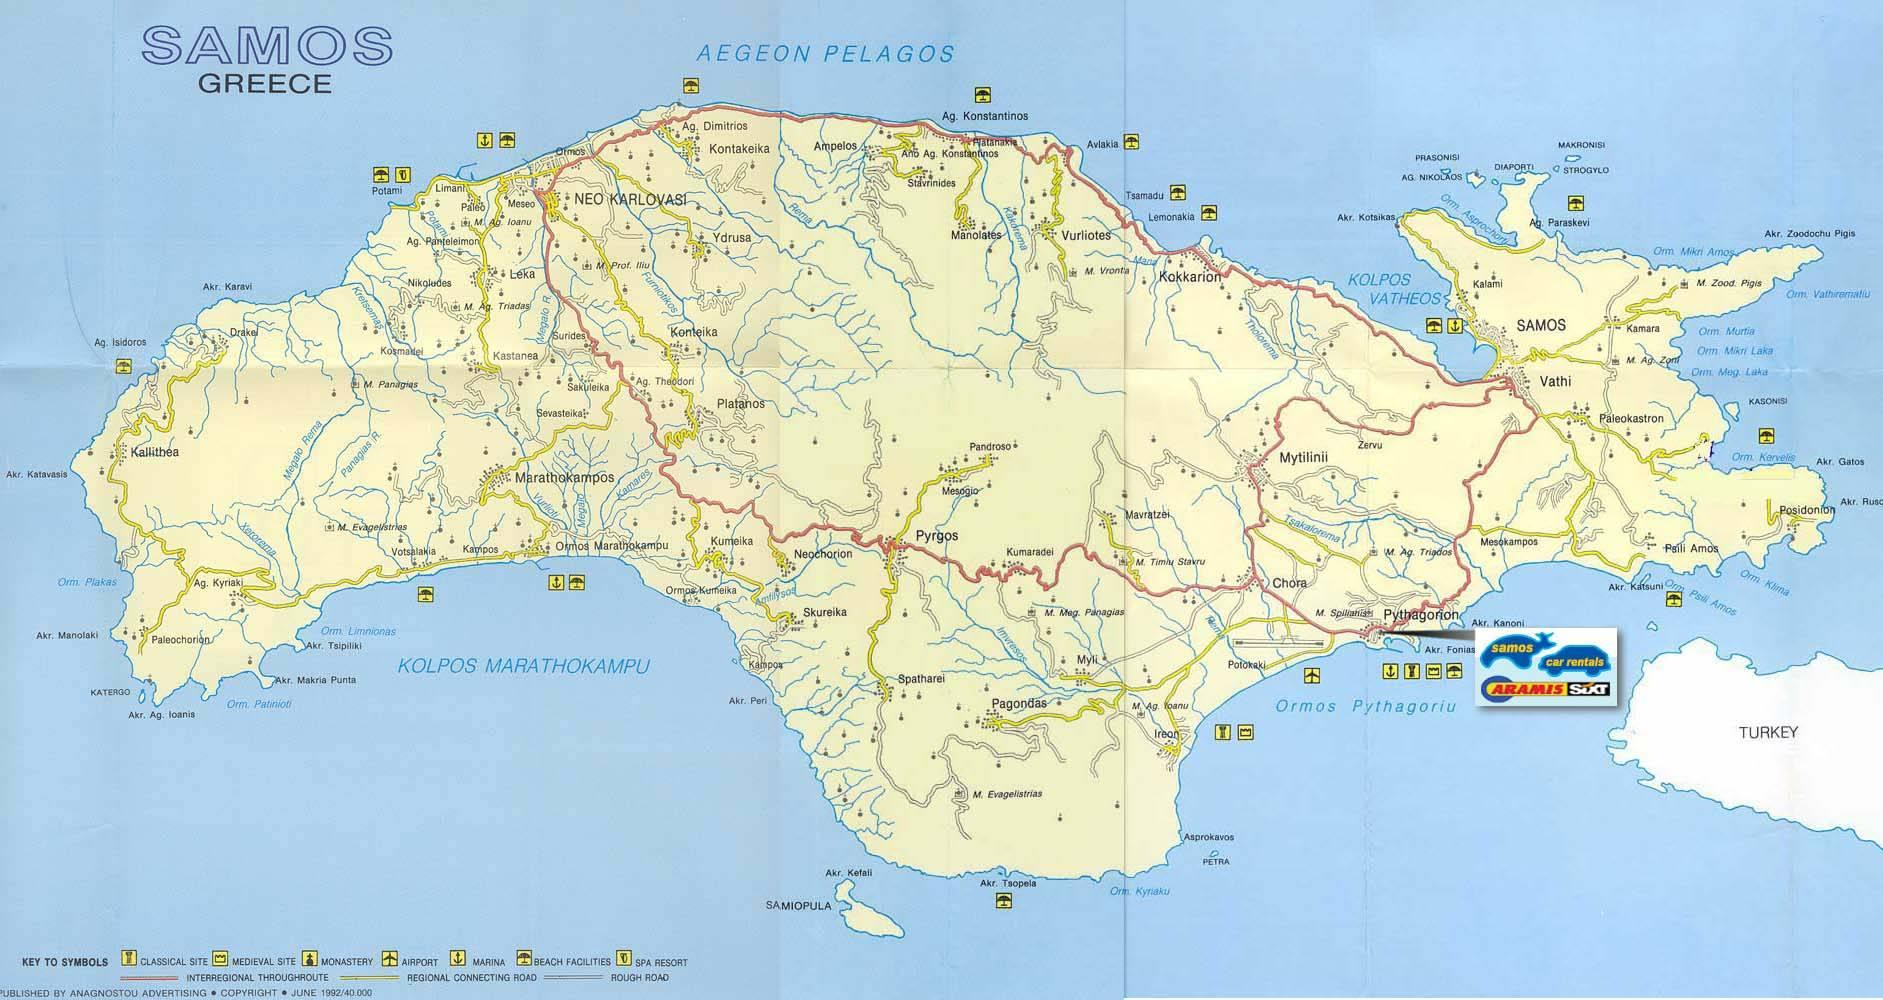 kart over samos Samos, Hellas kart   Kart Samos, Hellas (Sør Europa   Europa) kart over samos